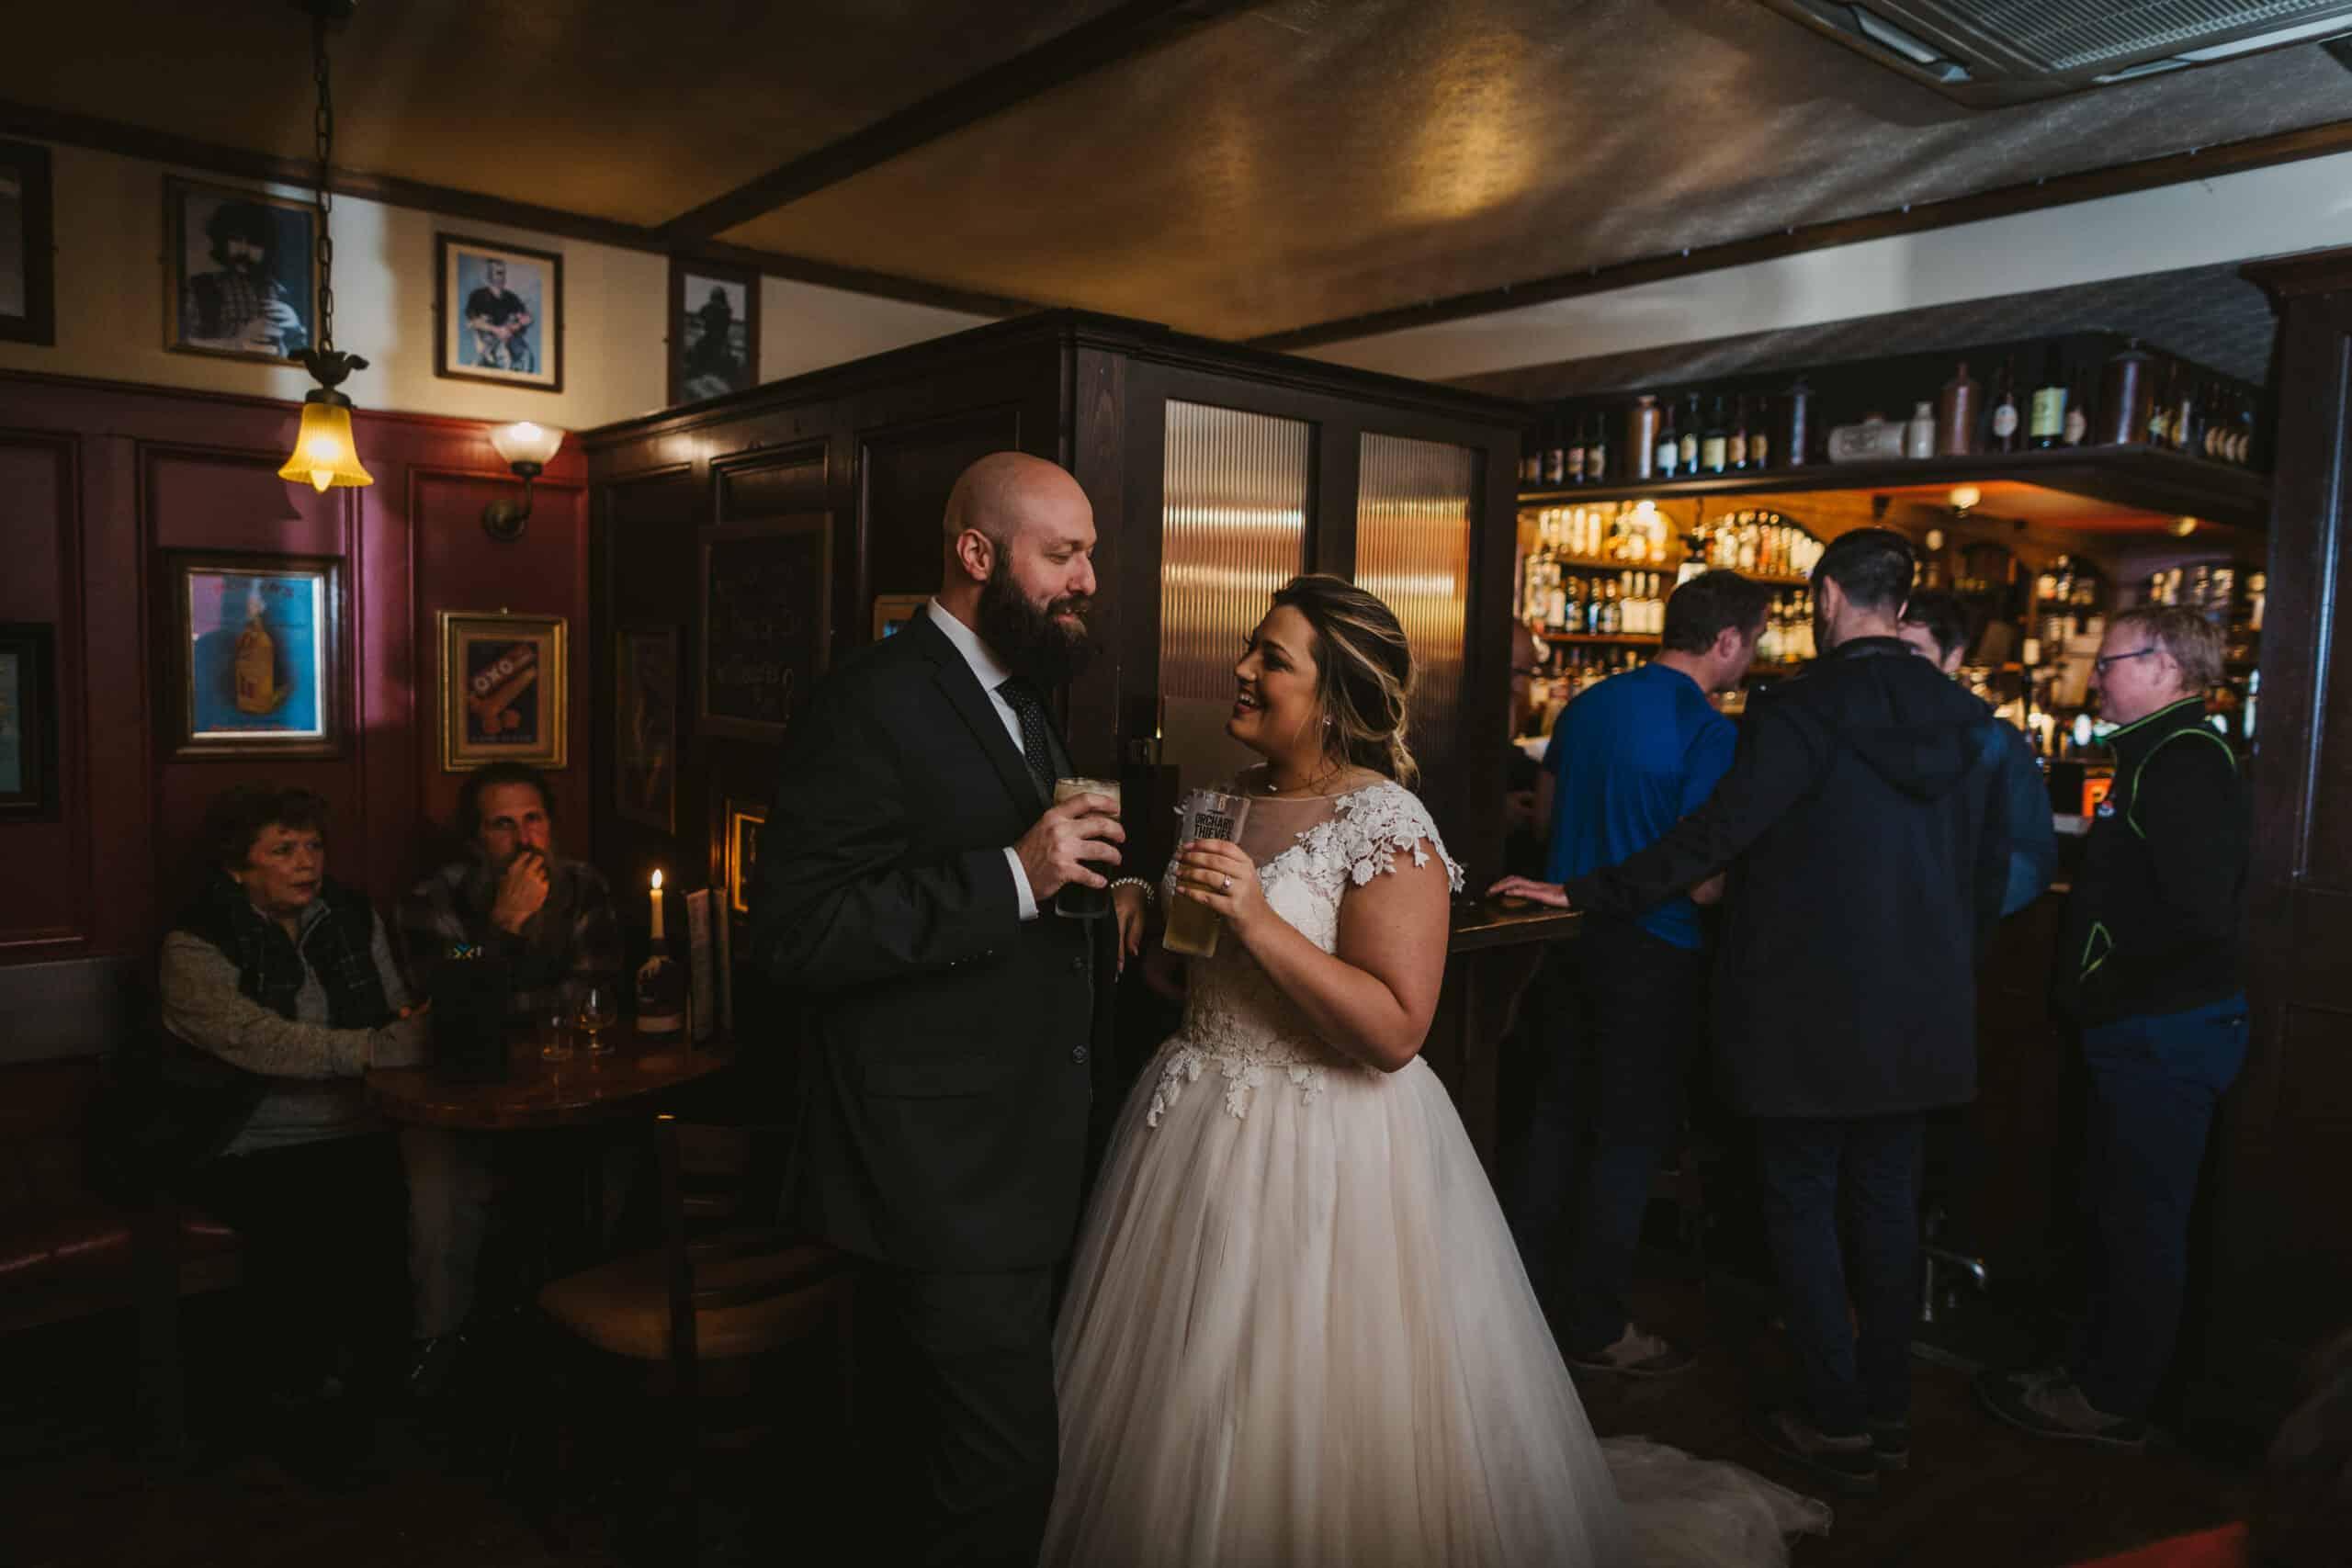 Cliffs of Moher Wedding Hags head, couple having a drink in irish pub